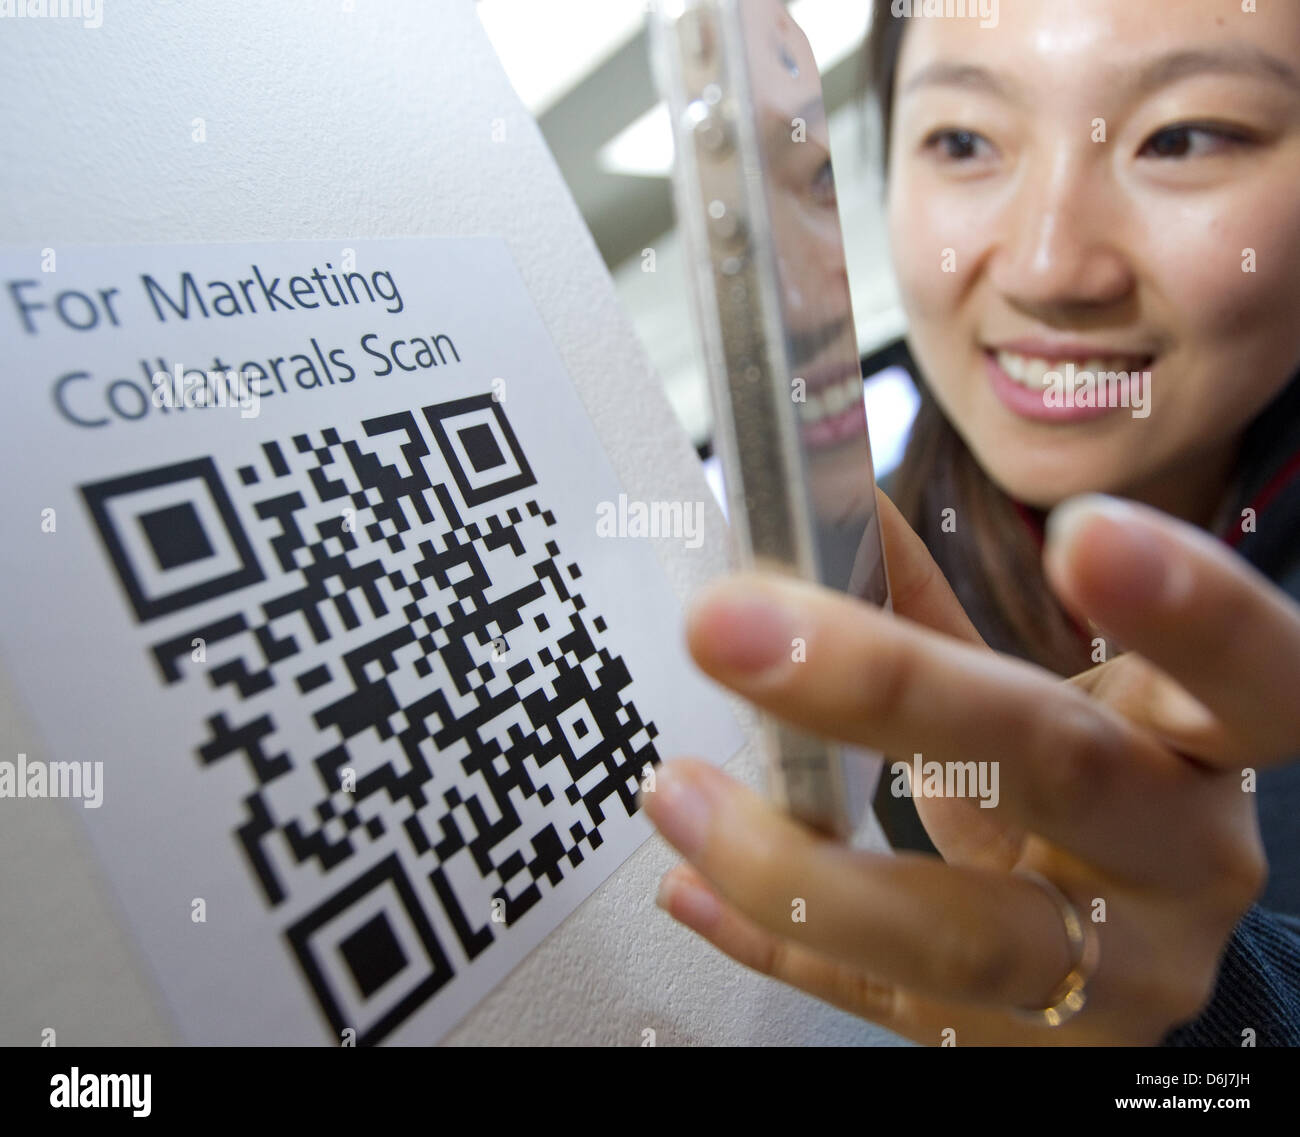 Staff member of the company Huawei Wang Li scans a QR code